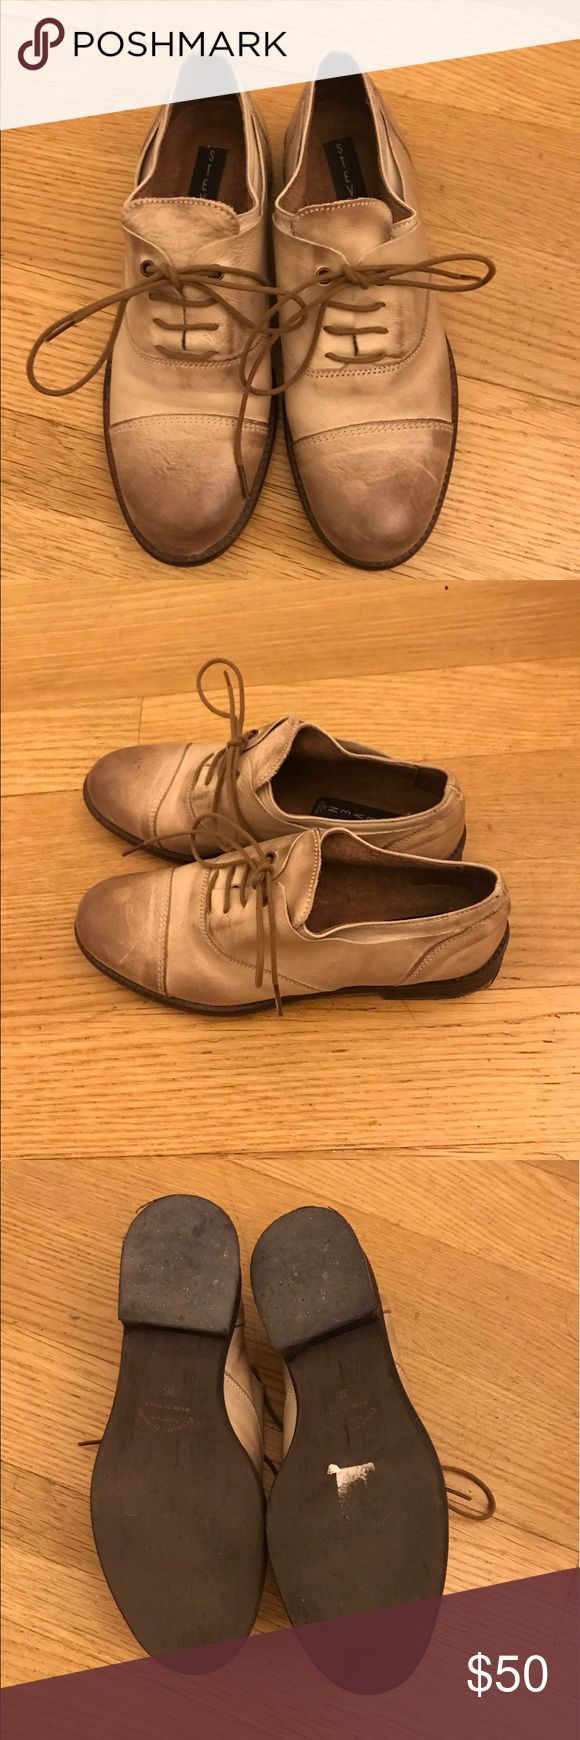 Steven by Steve Madden shoes - vintage feel Beautiful vintage like Steven shoes - barely worn. (1-2 times max). Steven by Steve Madden Shoes Flats & Loafers